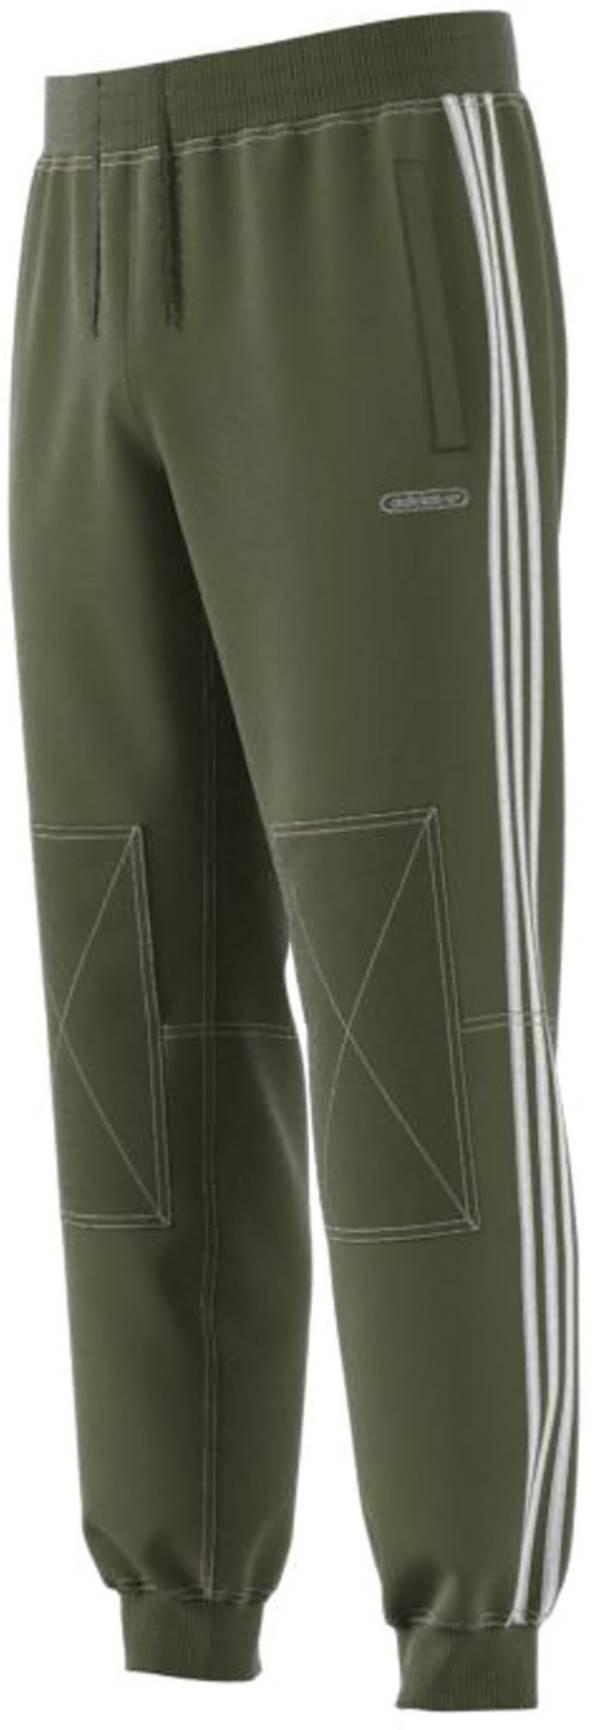 adidas Originals Men's WW Track Pants product image